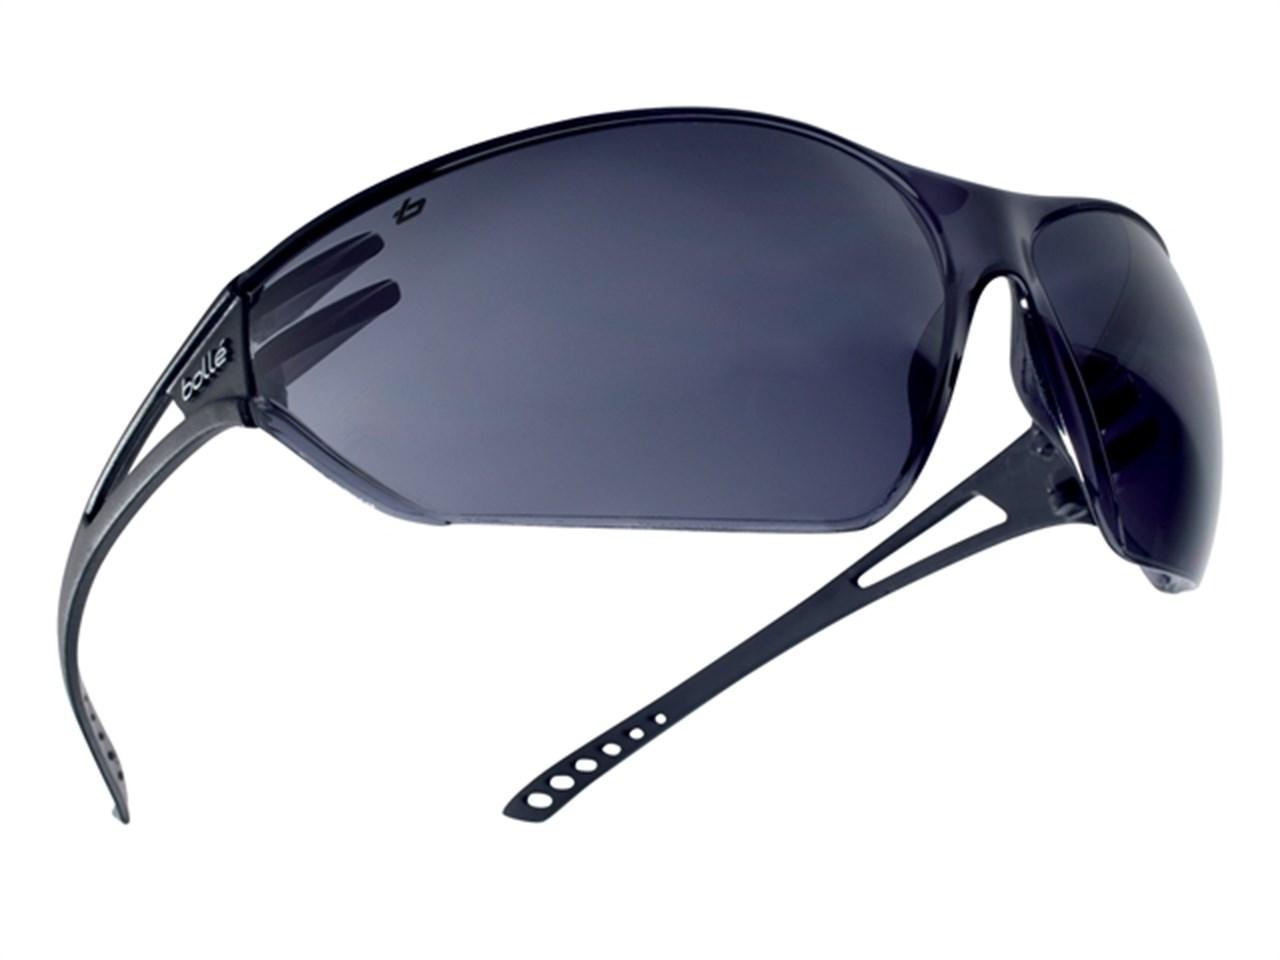 BOLLE Slam Safety Glasses - Smoke